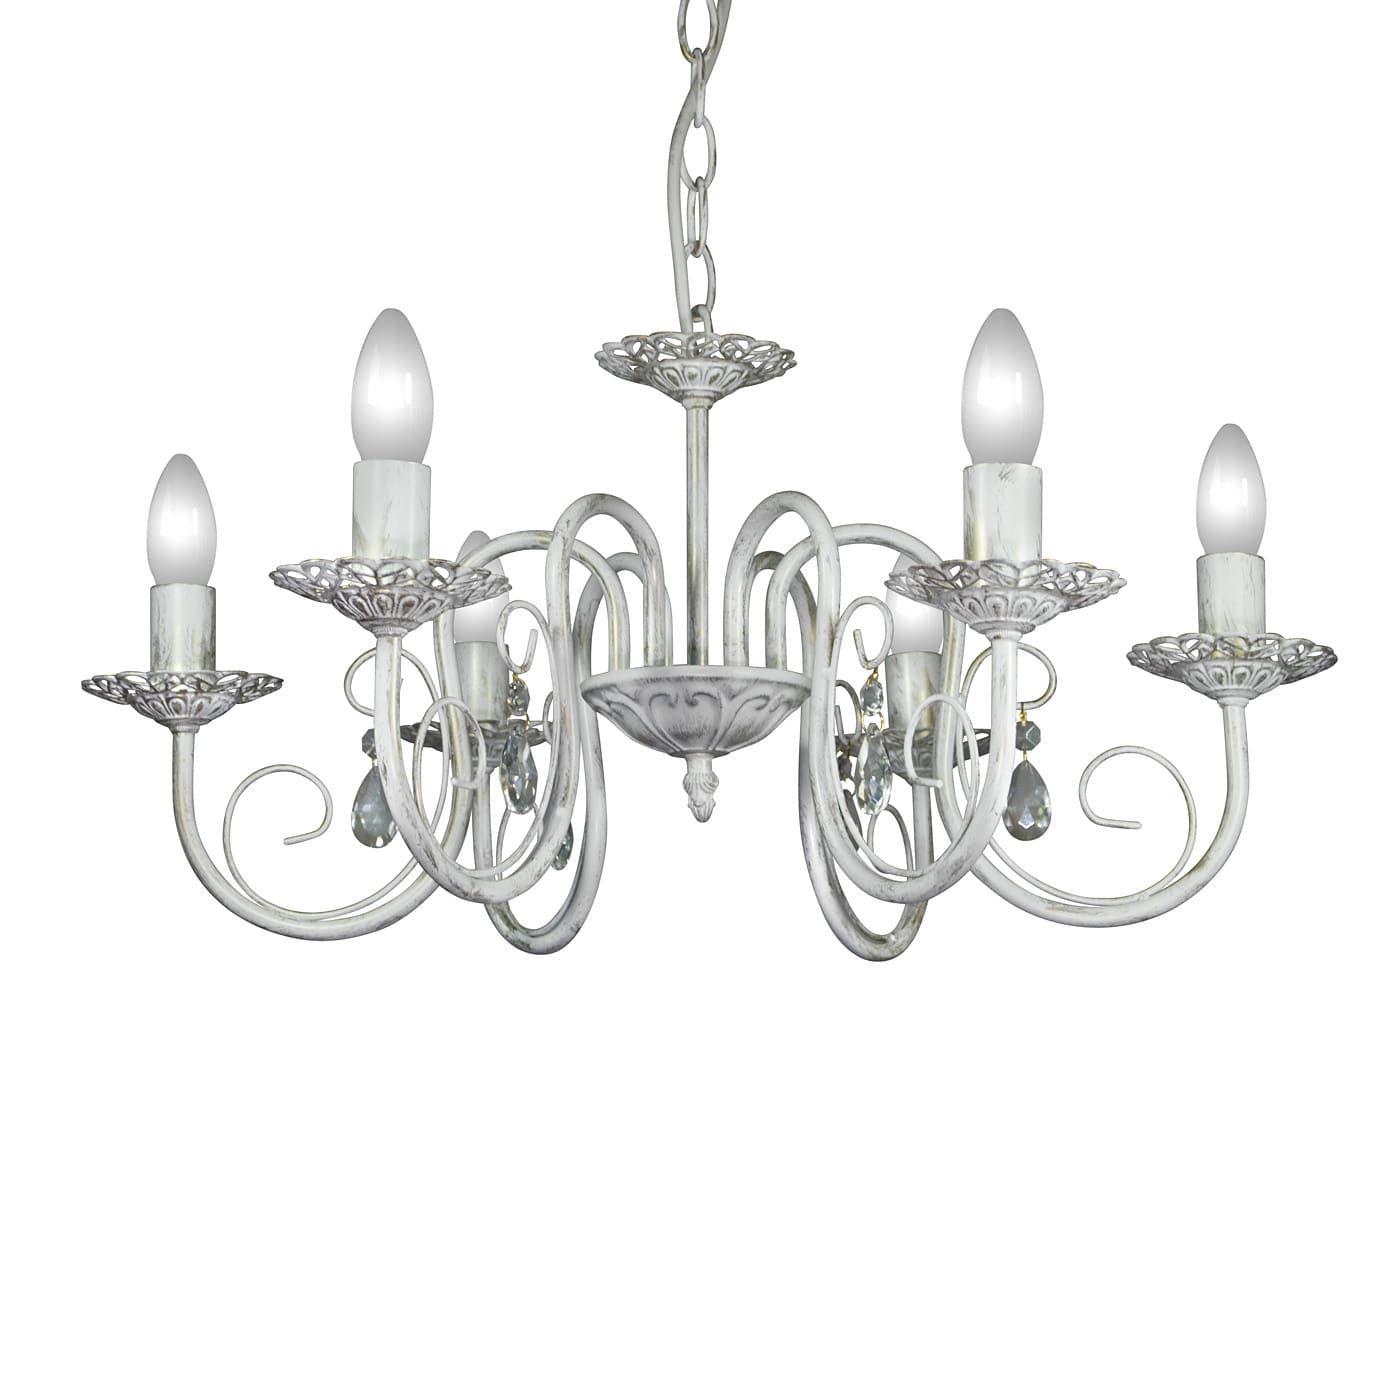 PETRASVET / Pendant chandelier S1170-6, 6xE14 max. 60W